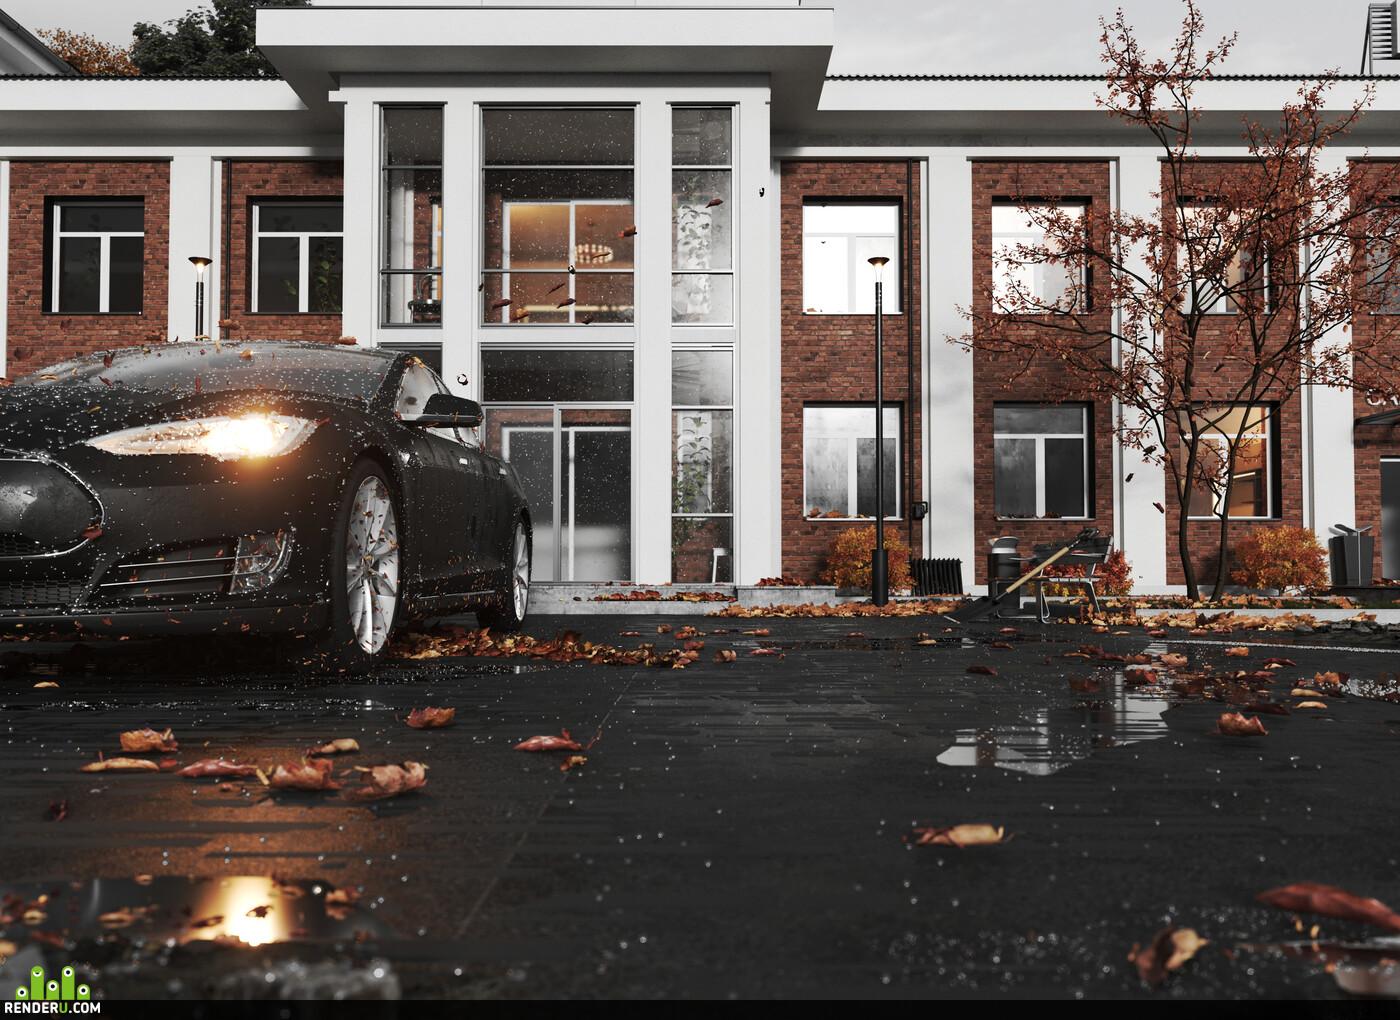 3ds Max, Corona Renderer, exterior., Exterior architecture, visualization, 3D Studio Max, architect